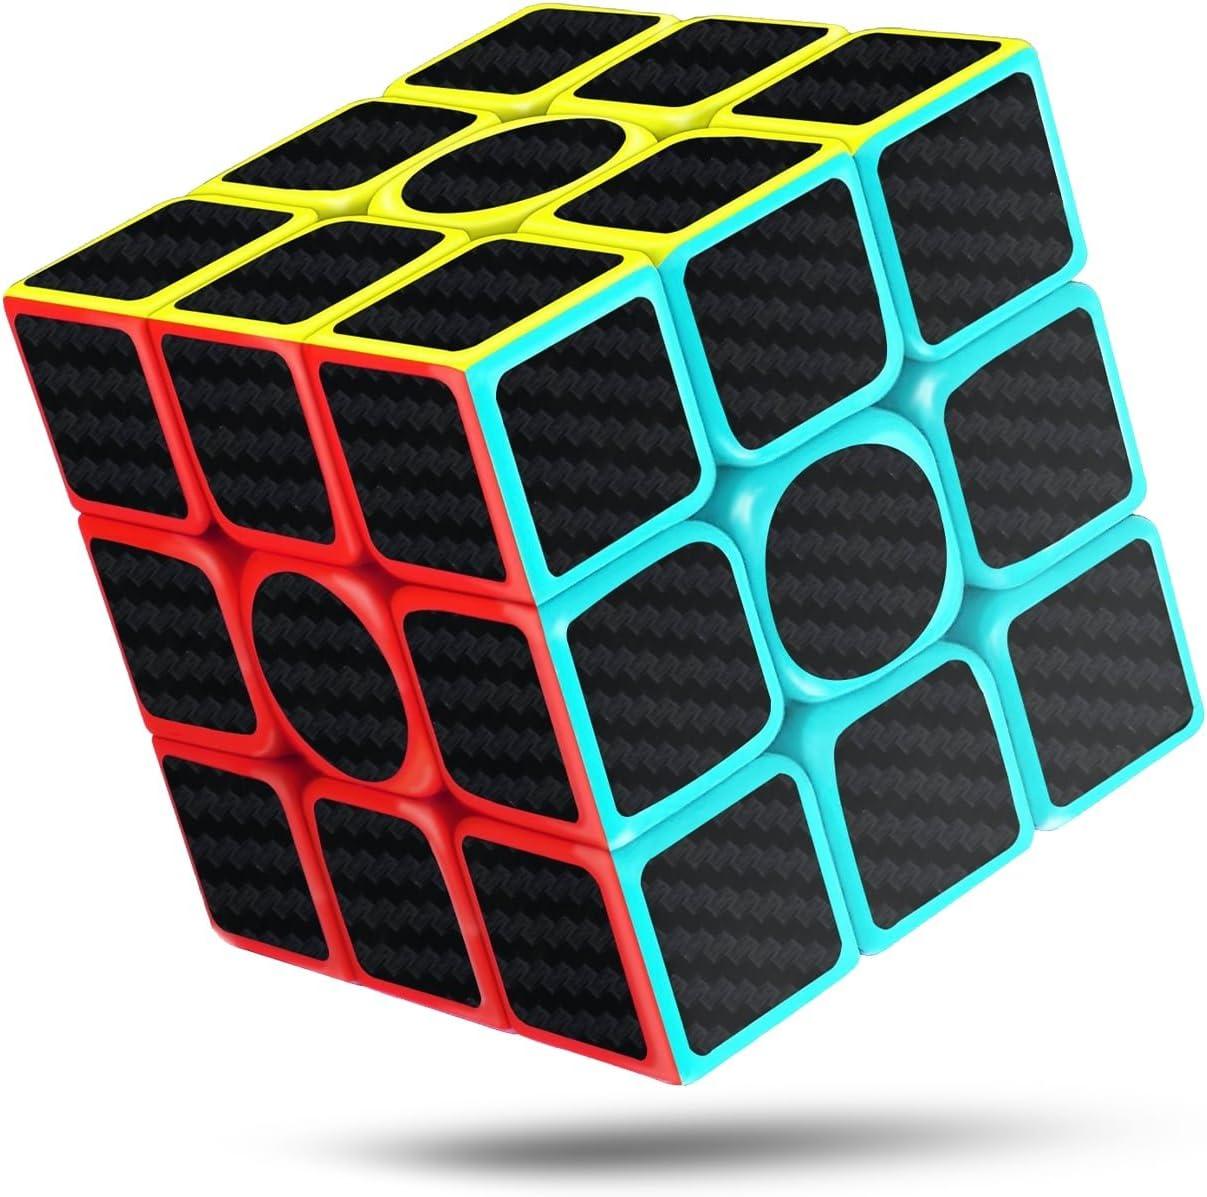 cfmour Cubo de Mágico, 3x3x3 Fibra de Carbono Suave Magia Cubo de ...